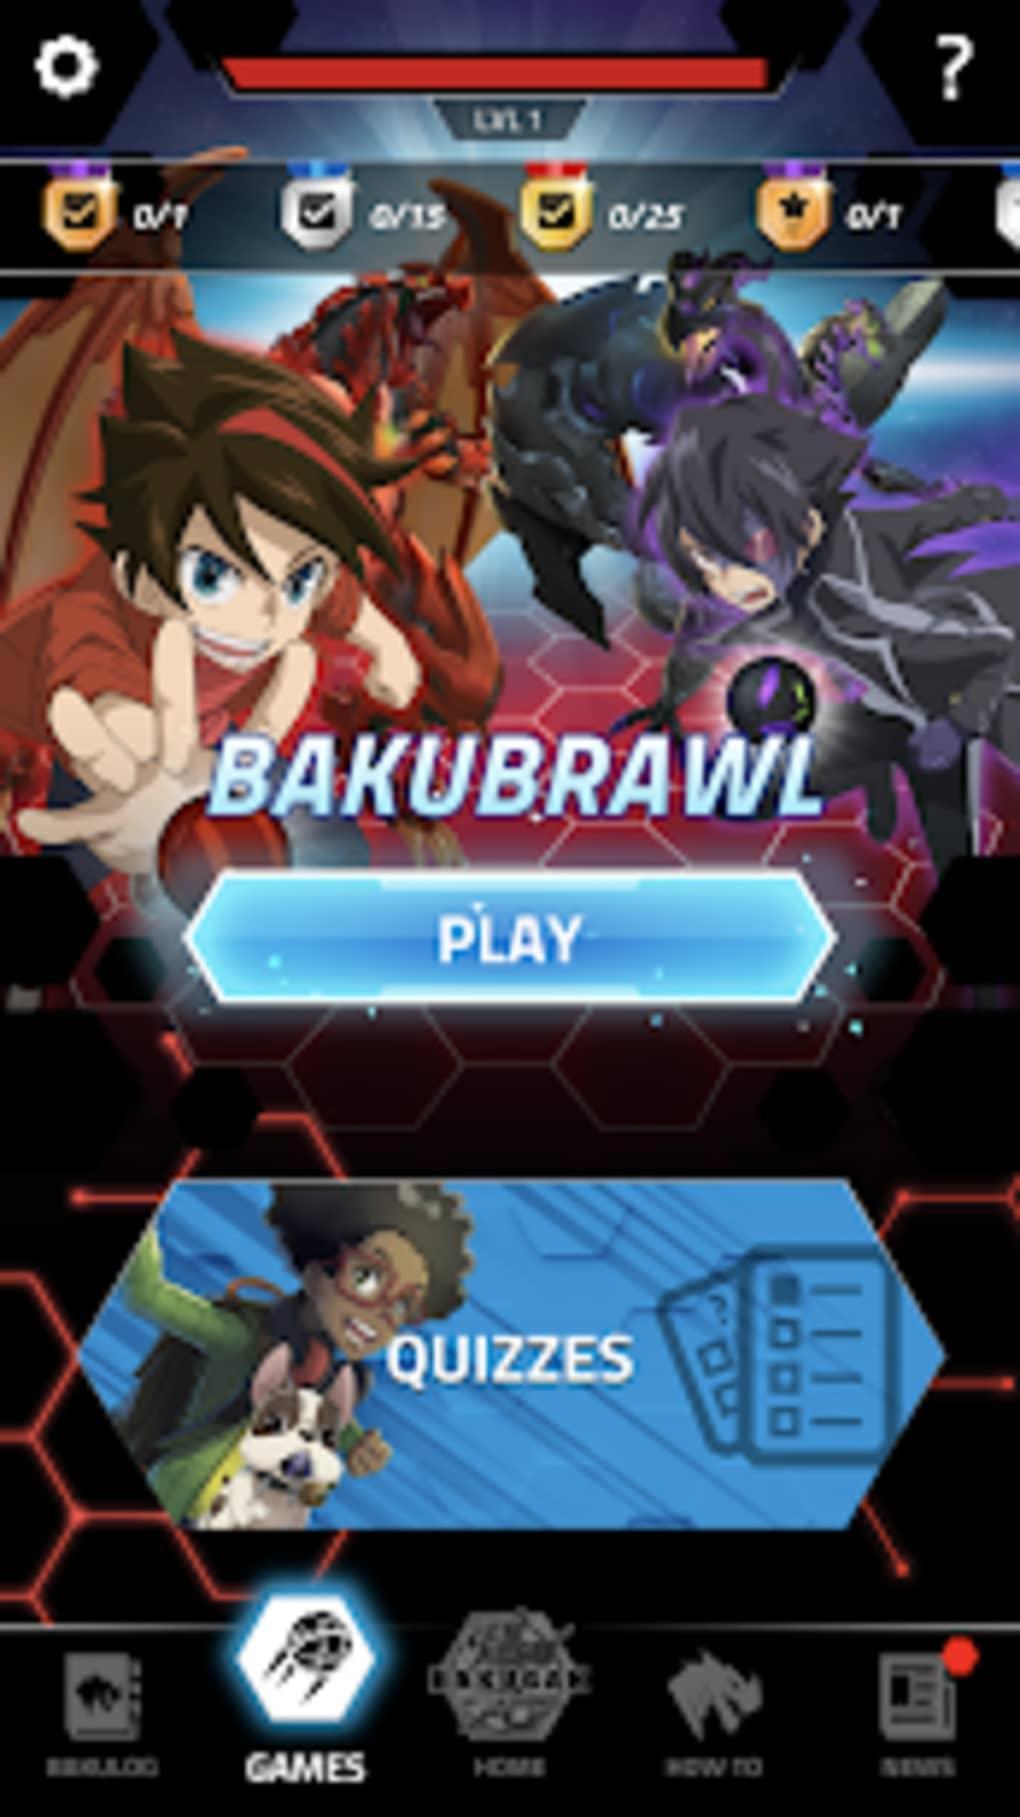 bakugan fan hub apk for android